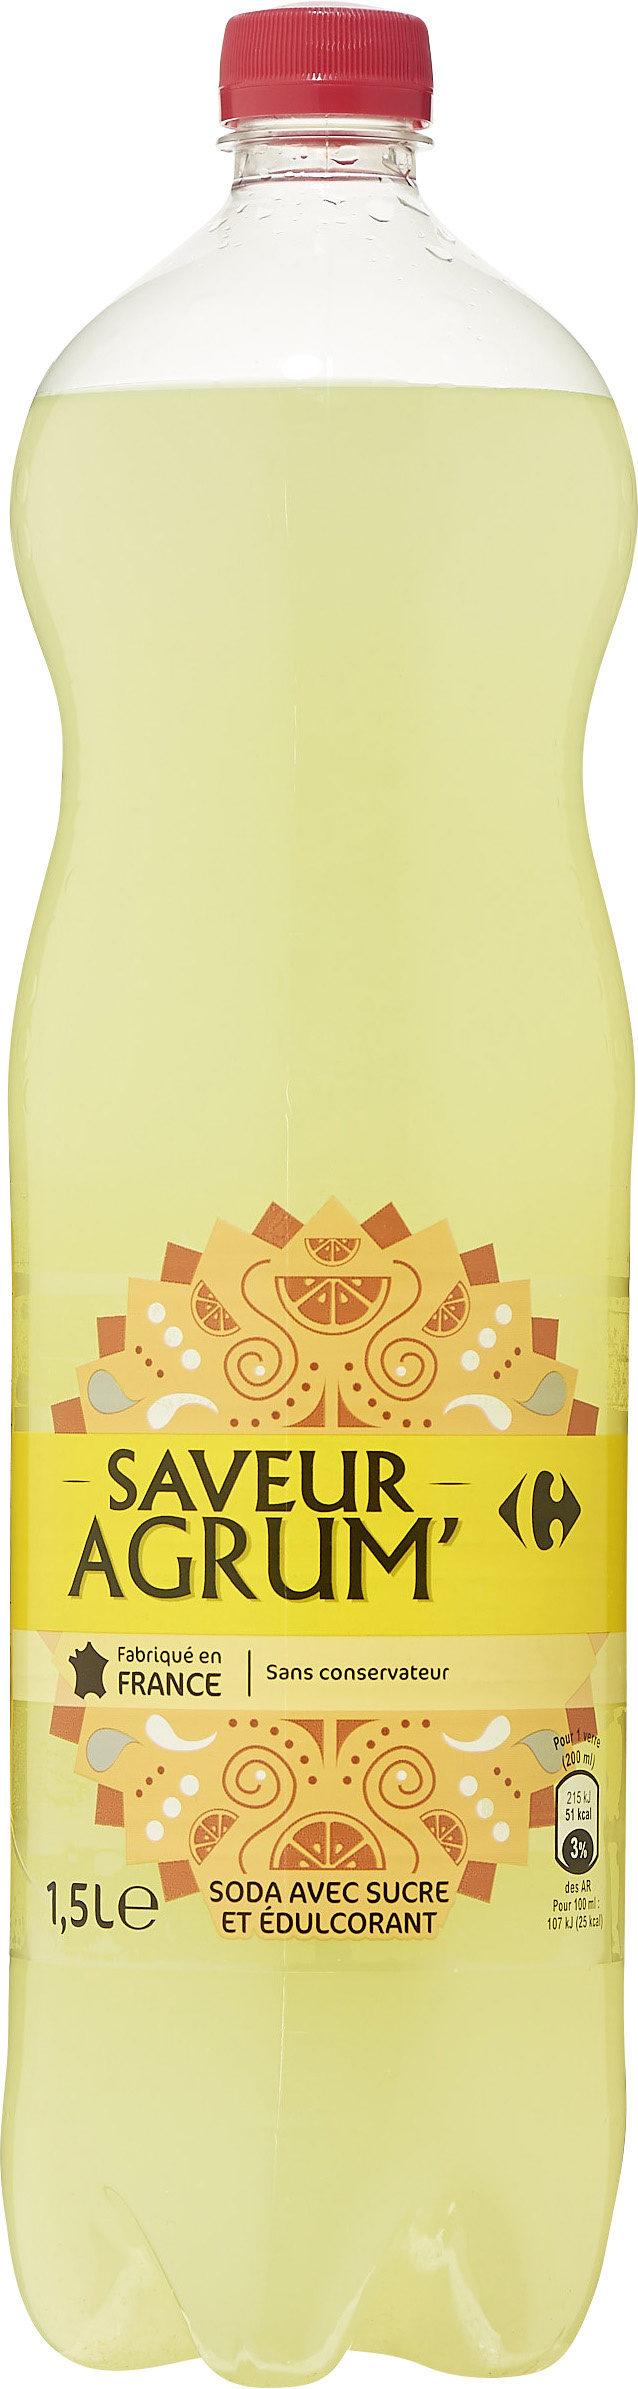 Saveur  agrum' - Product